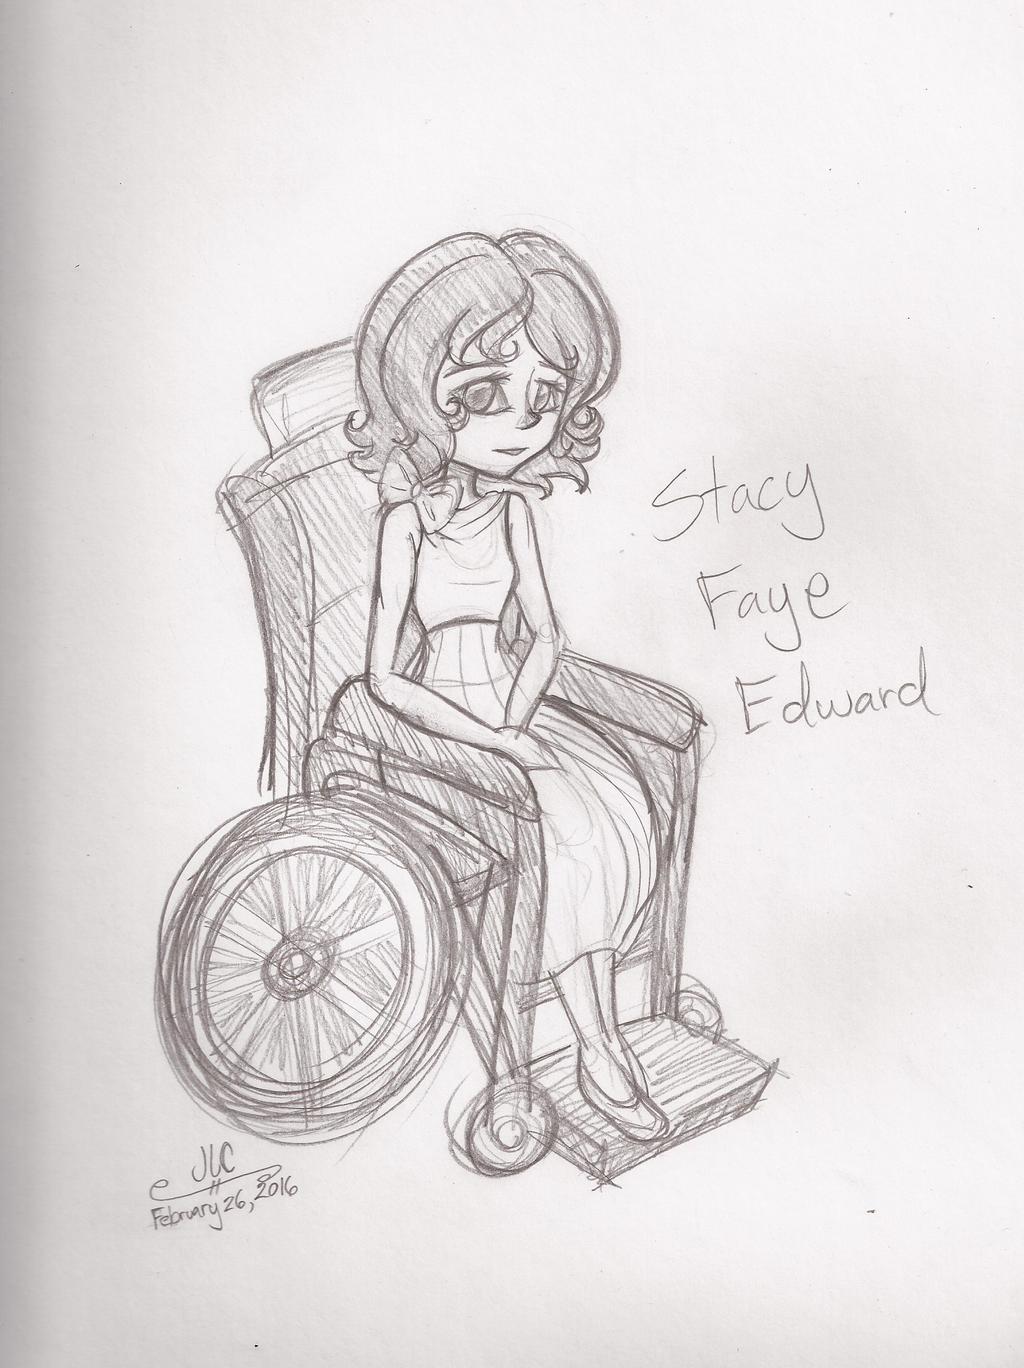 Stacy Faye Edward - Design Sketch